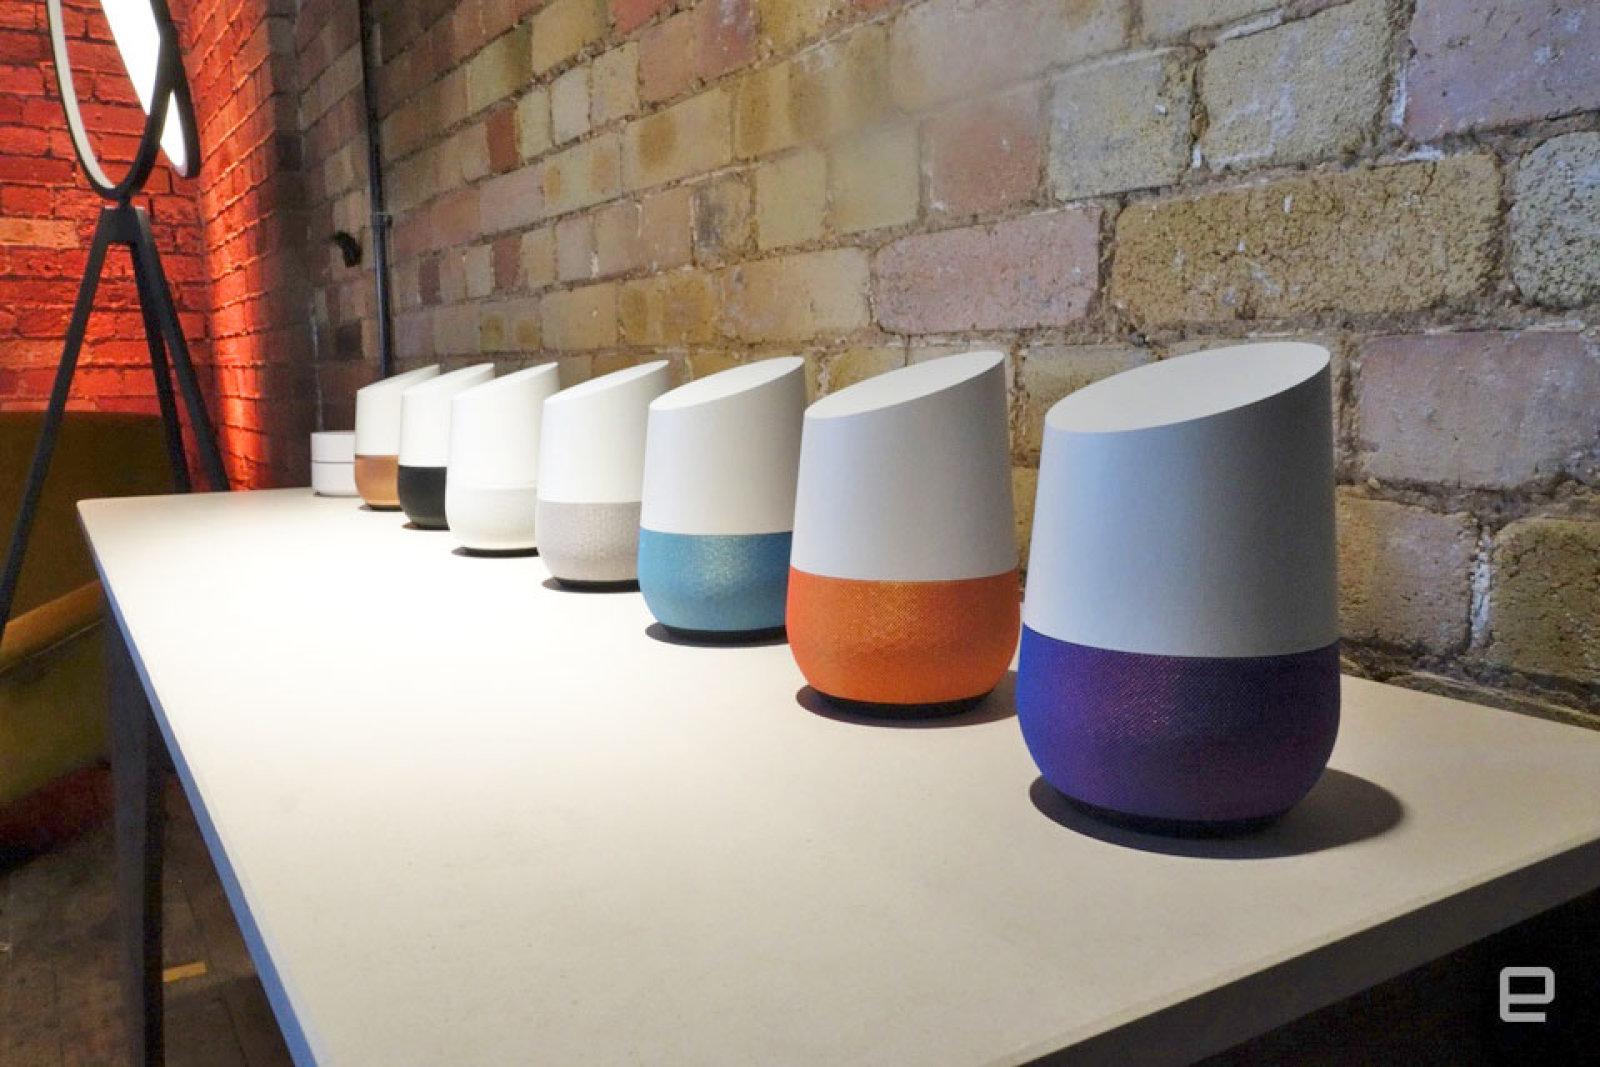 Google Assistant plays music from Pandora Premium.